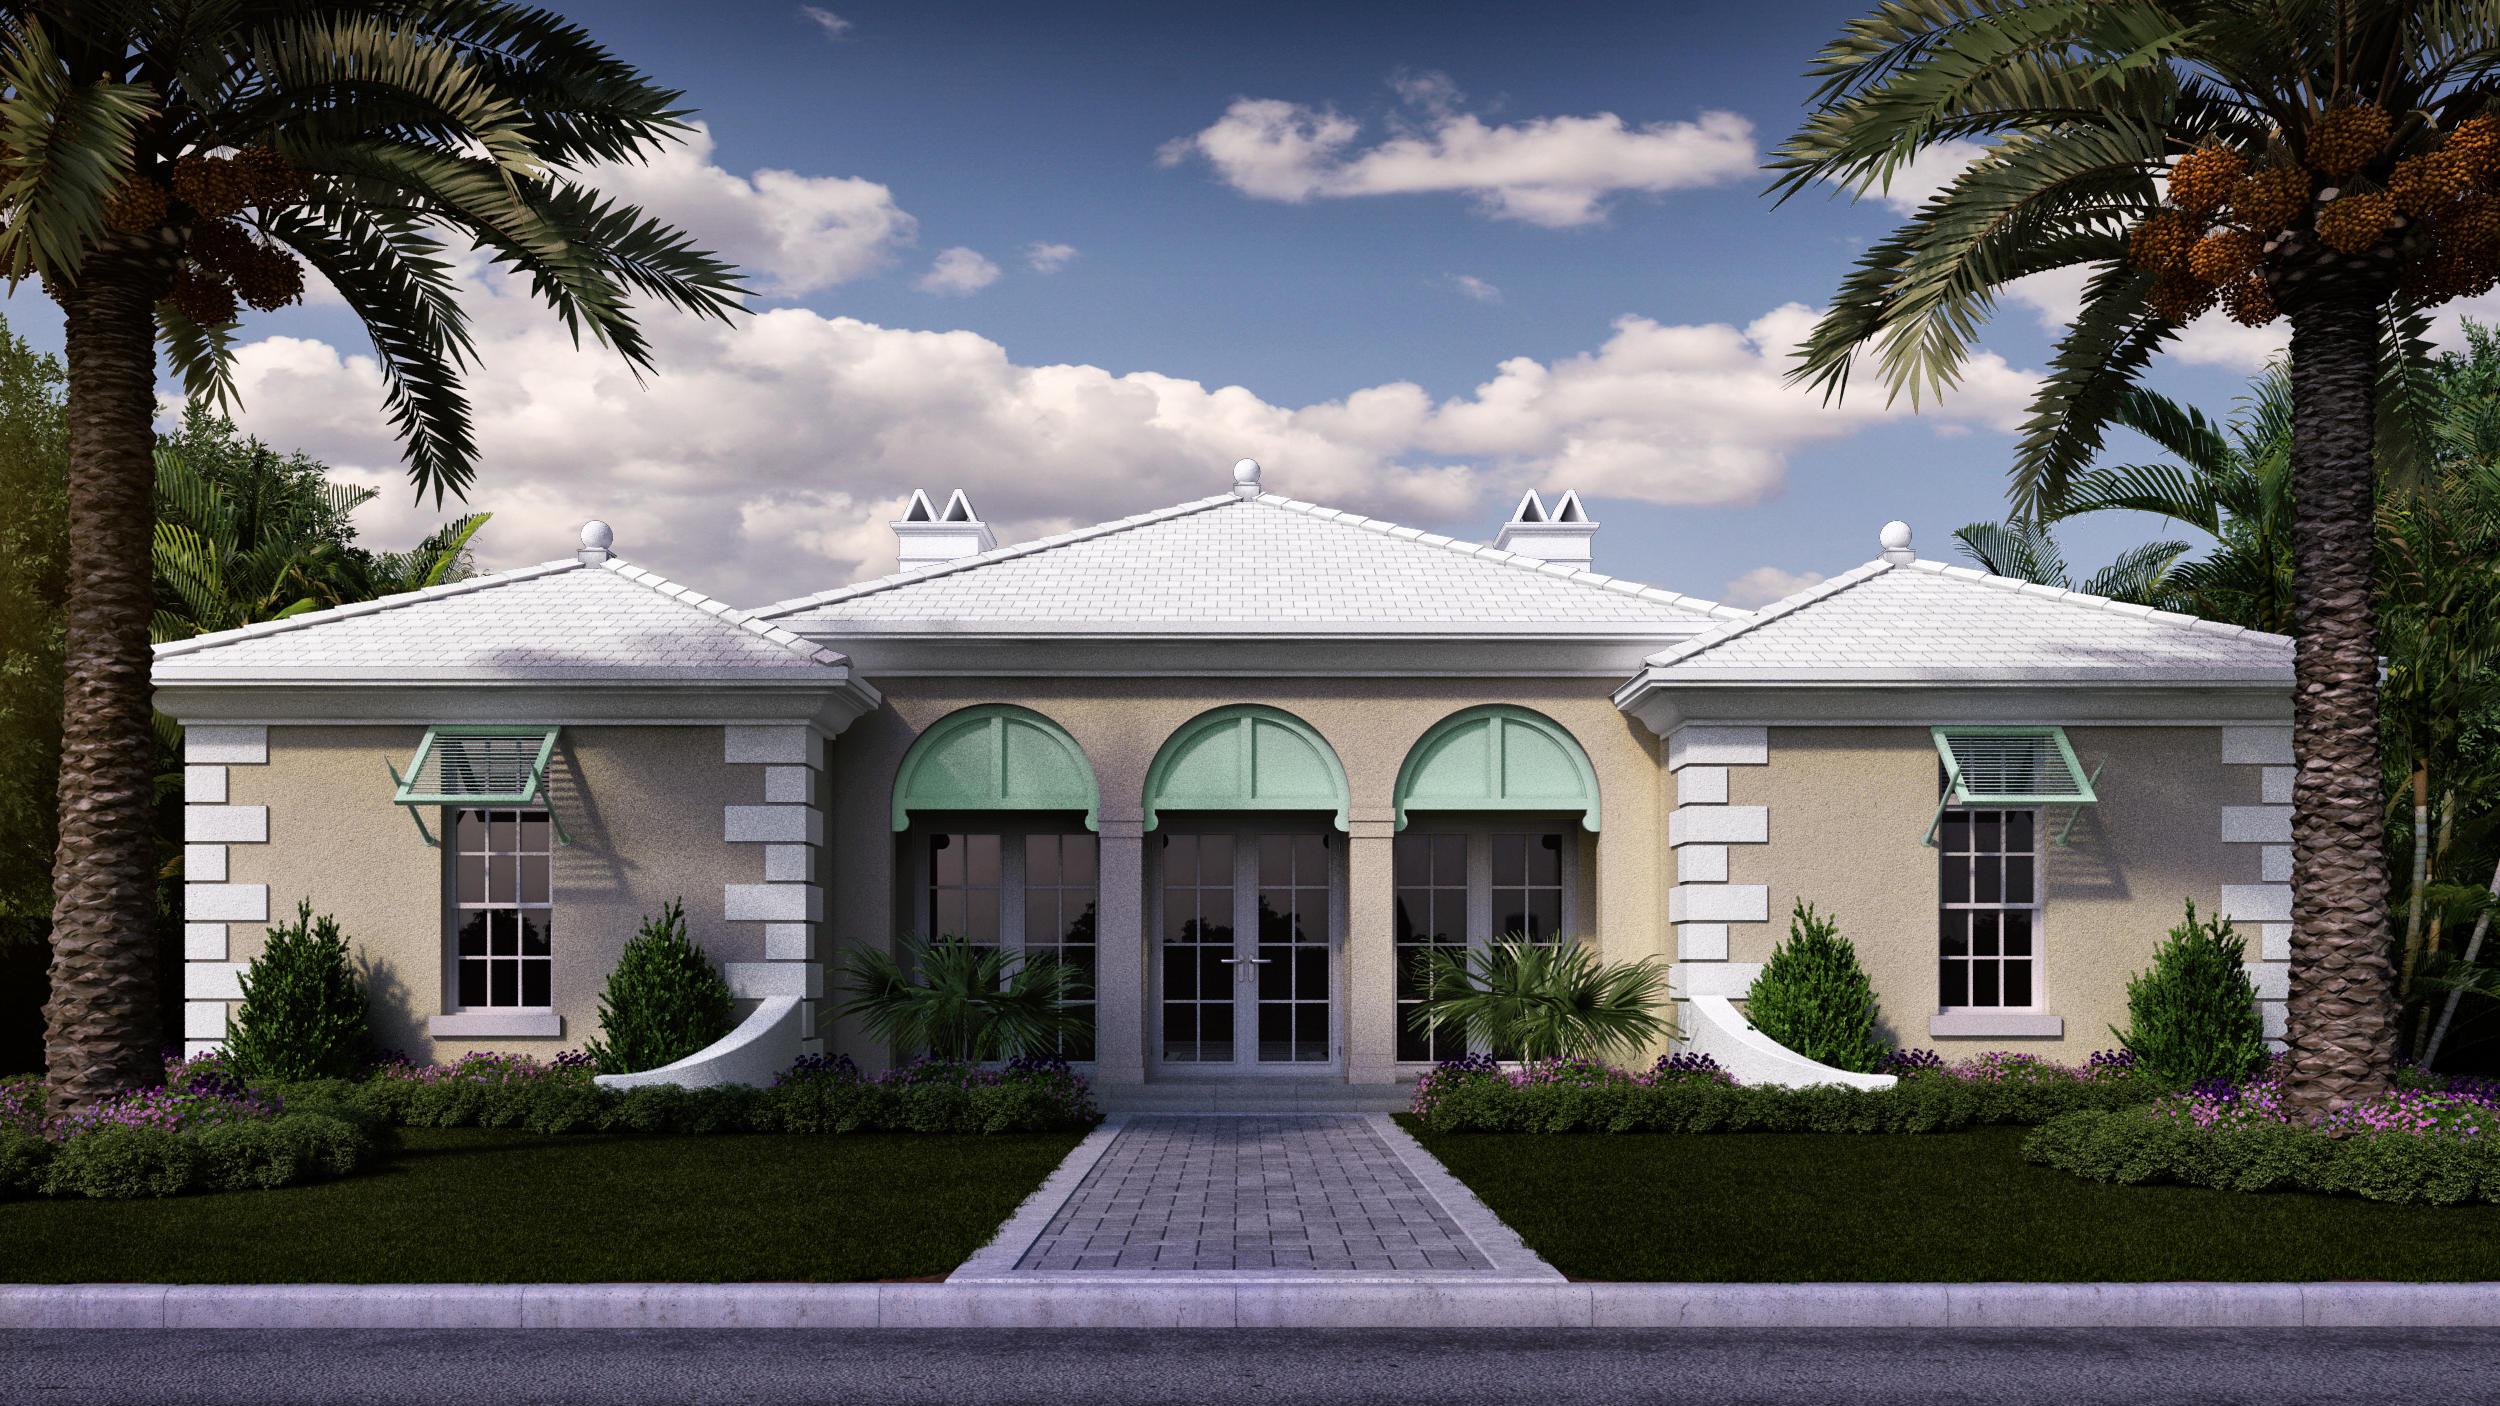 2628 Greenway Drive, Jupiter, Florida 33458, 3 Bedrooms Bedrooms, ,3.1 BathroomsBathrooms,A,Single family,Greenway,RX-10418400